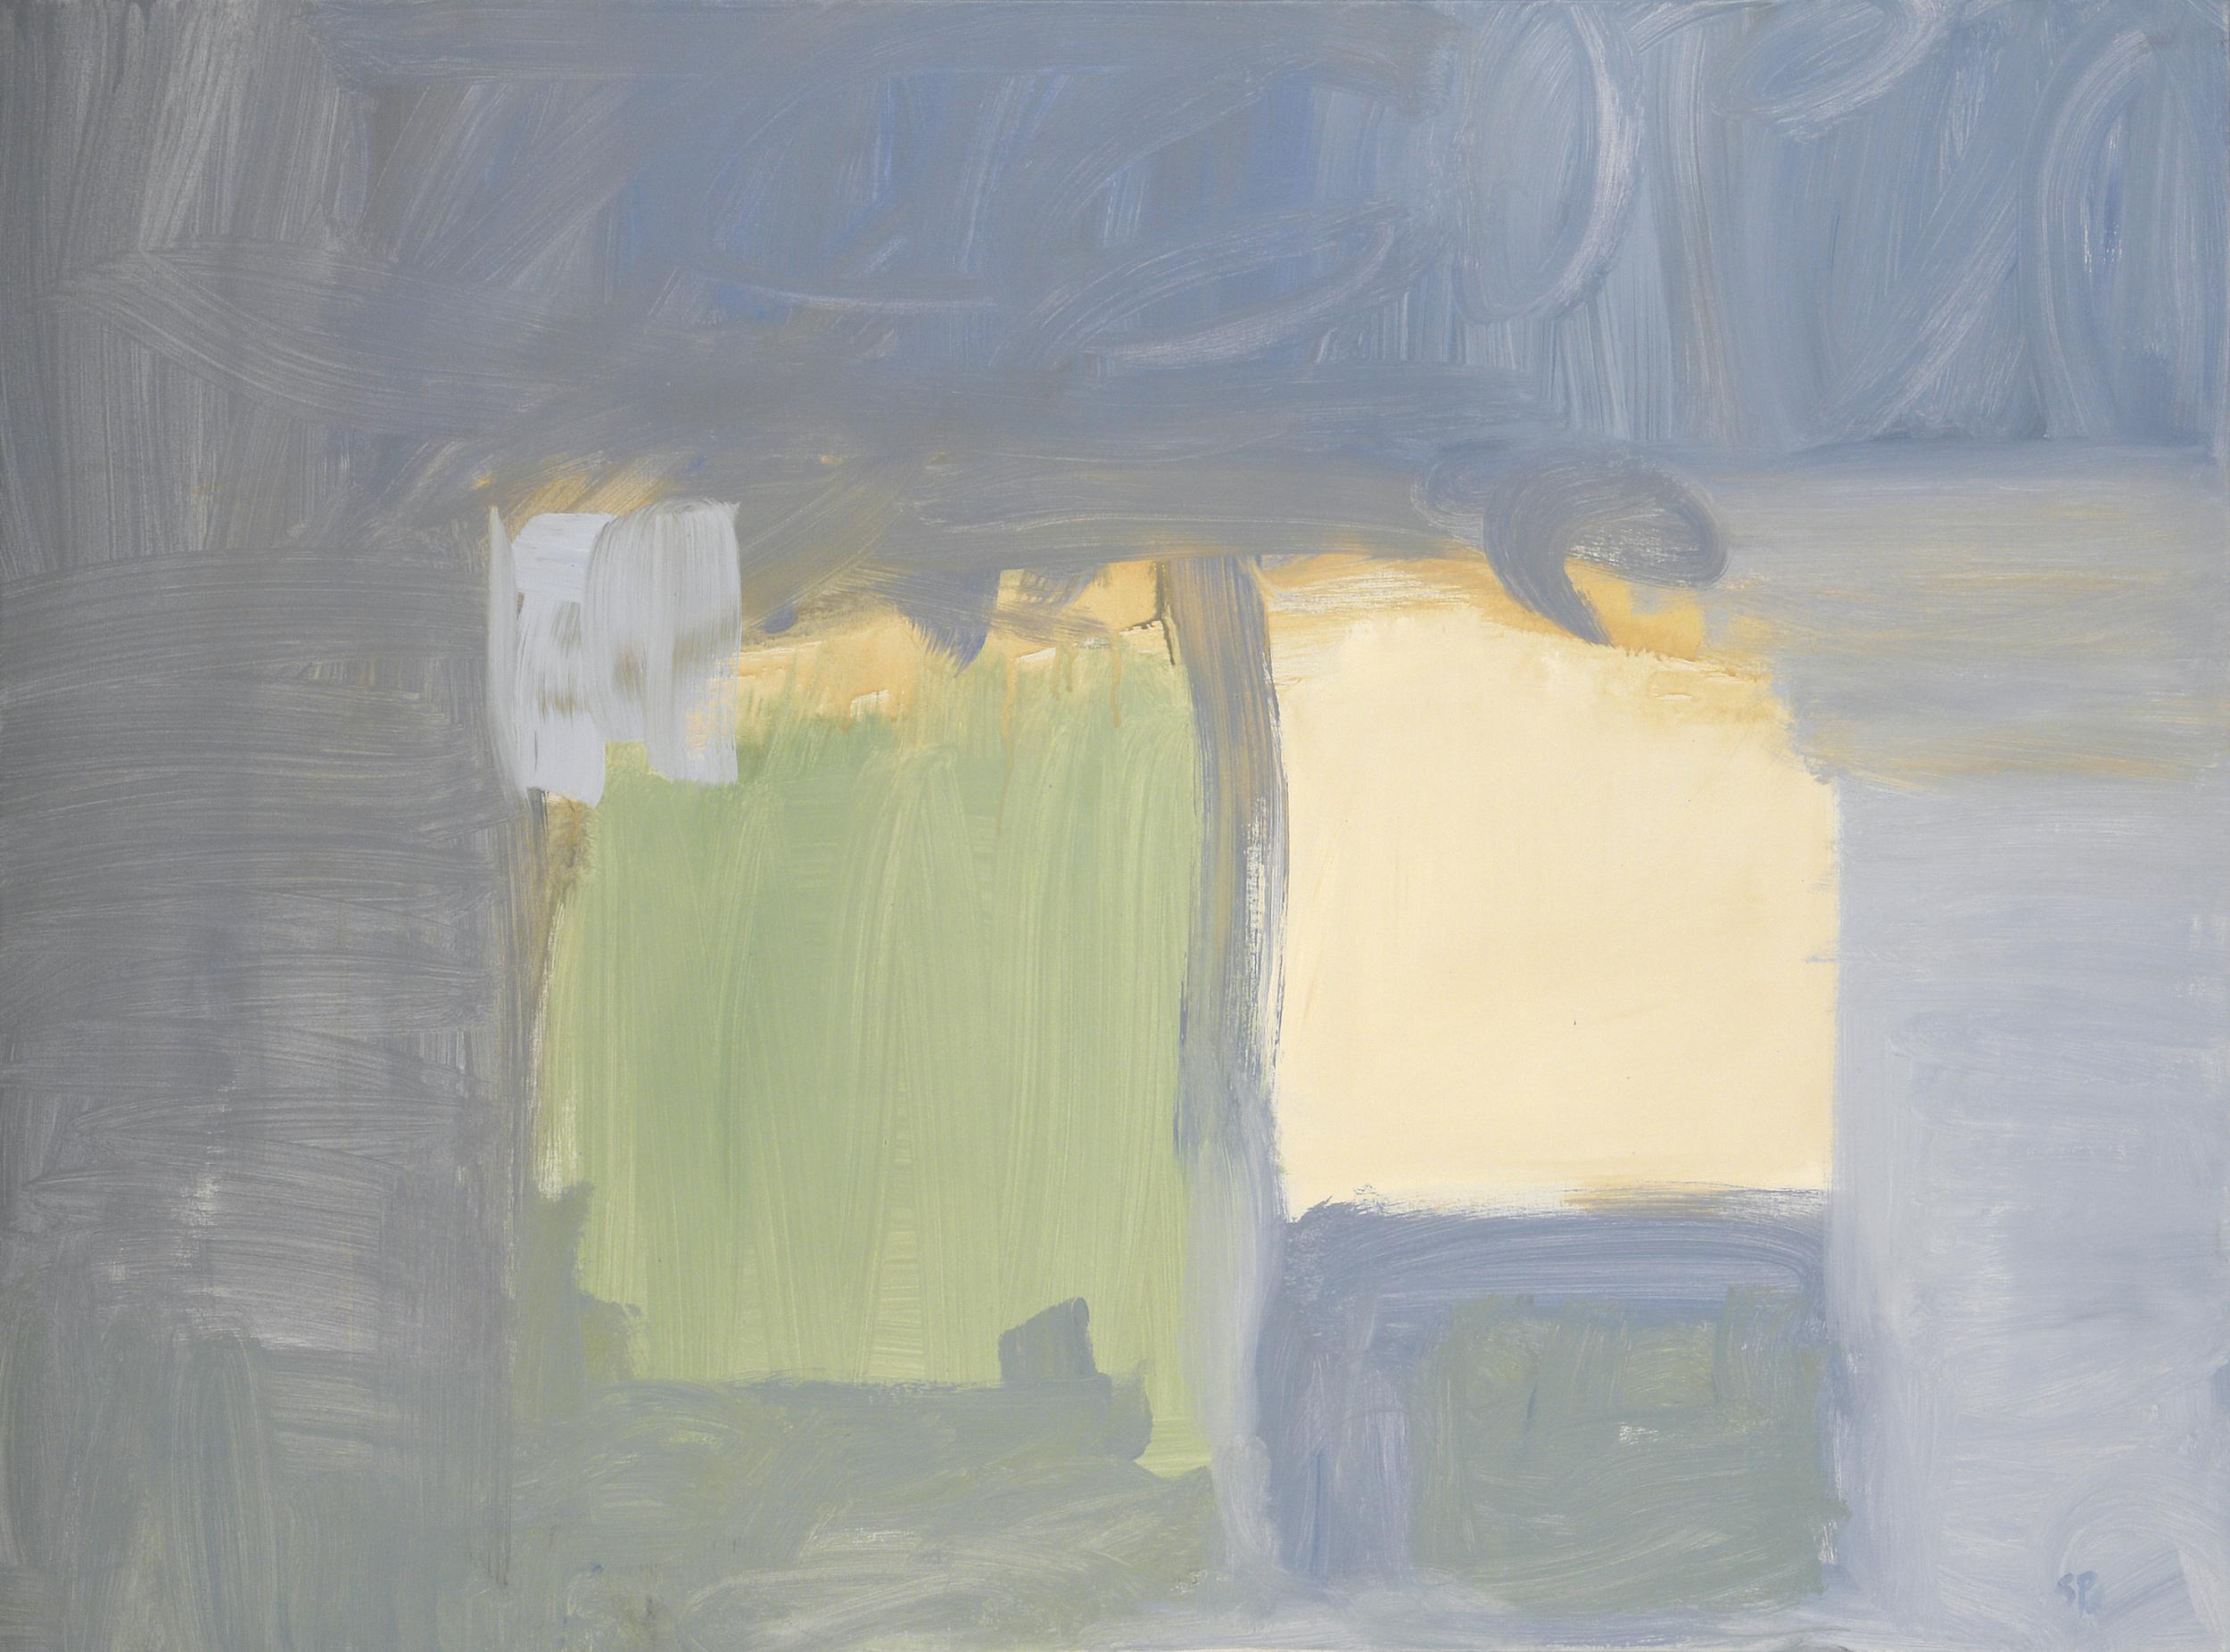 Blue Blocks  36 x 48 inches  Acrylic on canvas